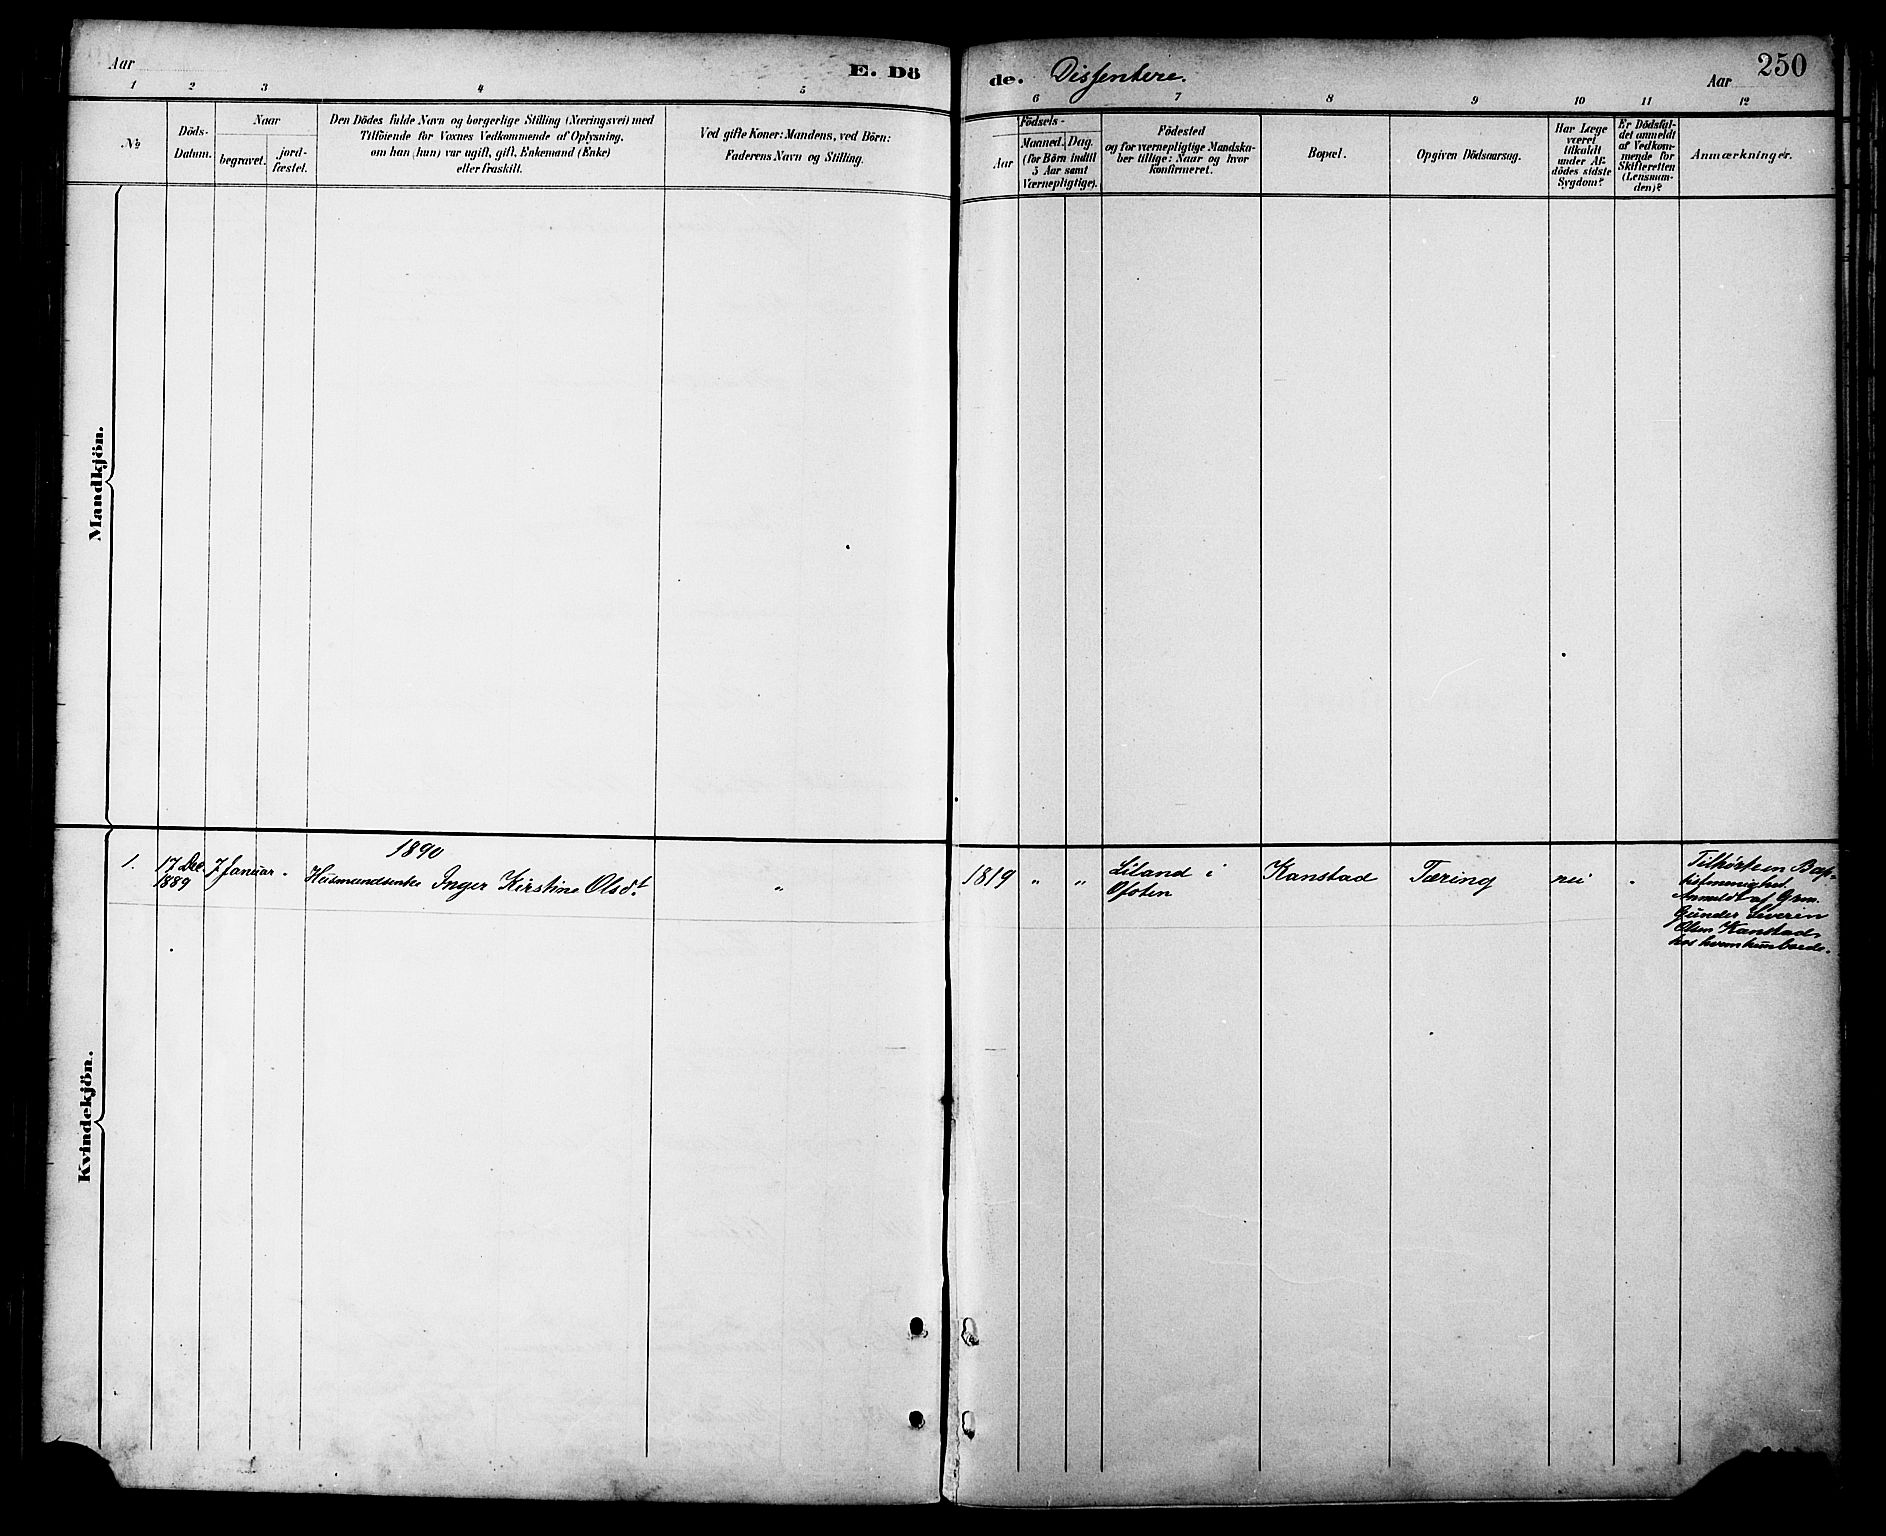 SAT, Ministerialprotokoller, klokkerbøker og fødselsregistre - Nordland, 872/L1035: Ministerialbok nr. 872A10, 1884-1896, s. 250